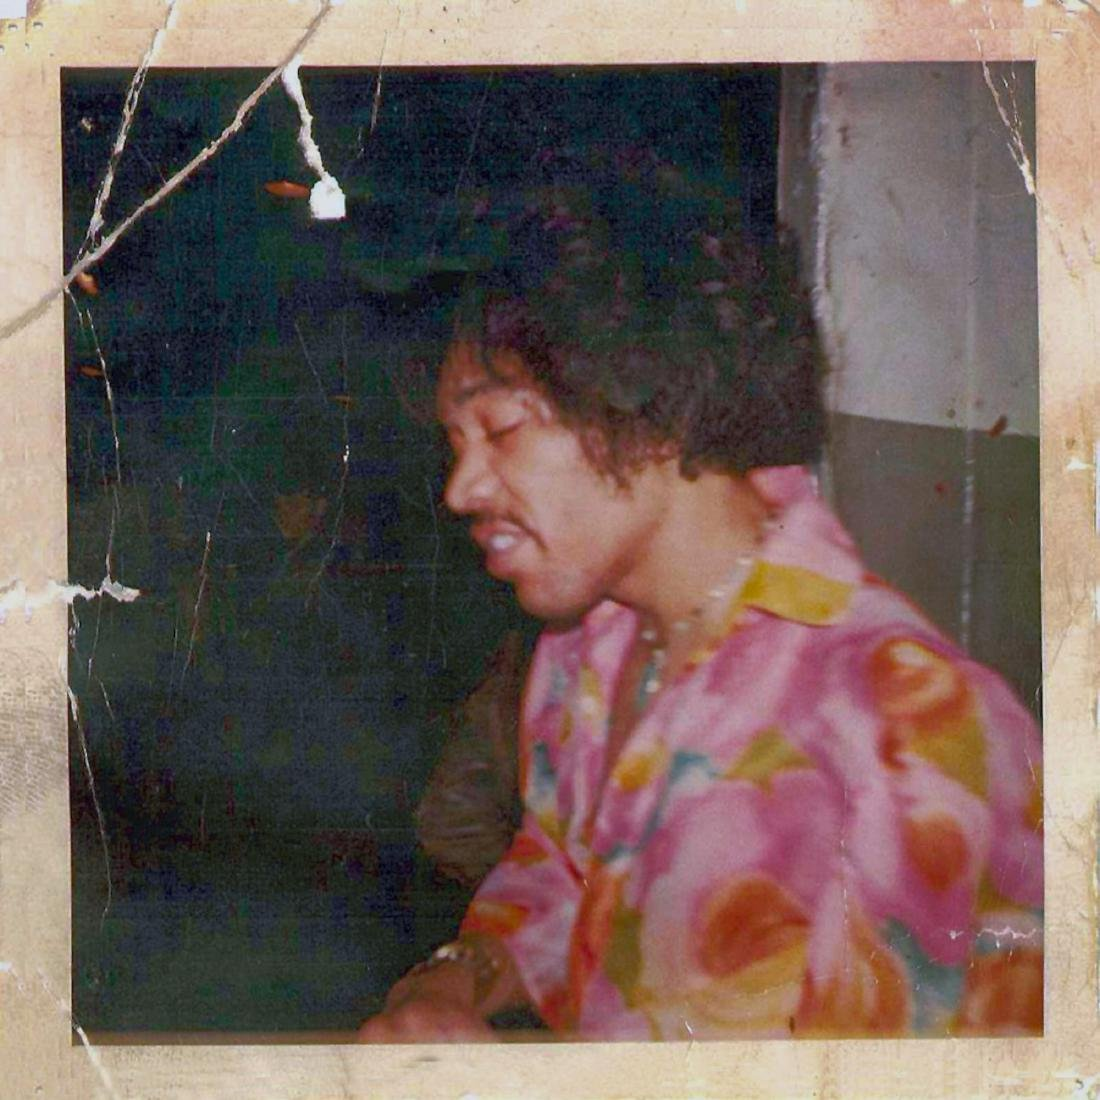 Jimi Hendrix tripping on LSD Polaroid  NYC 1967.  This